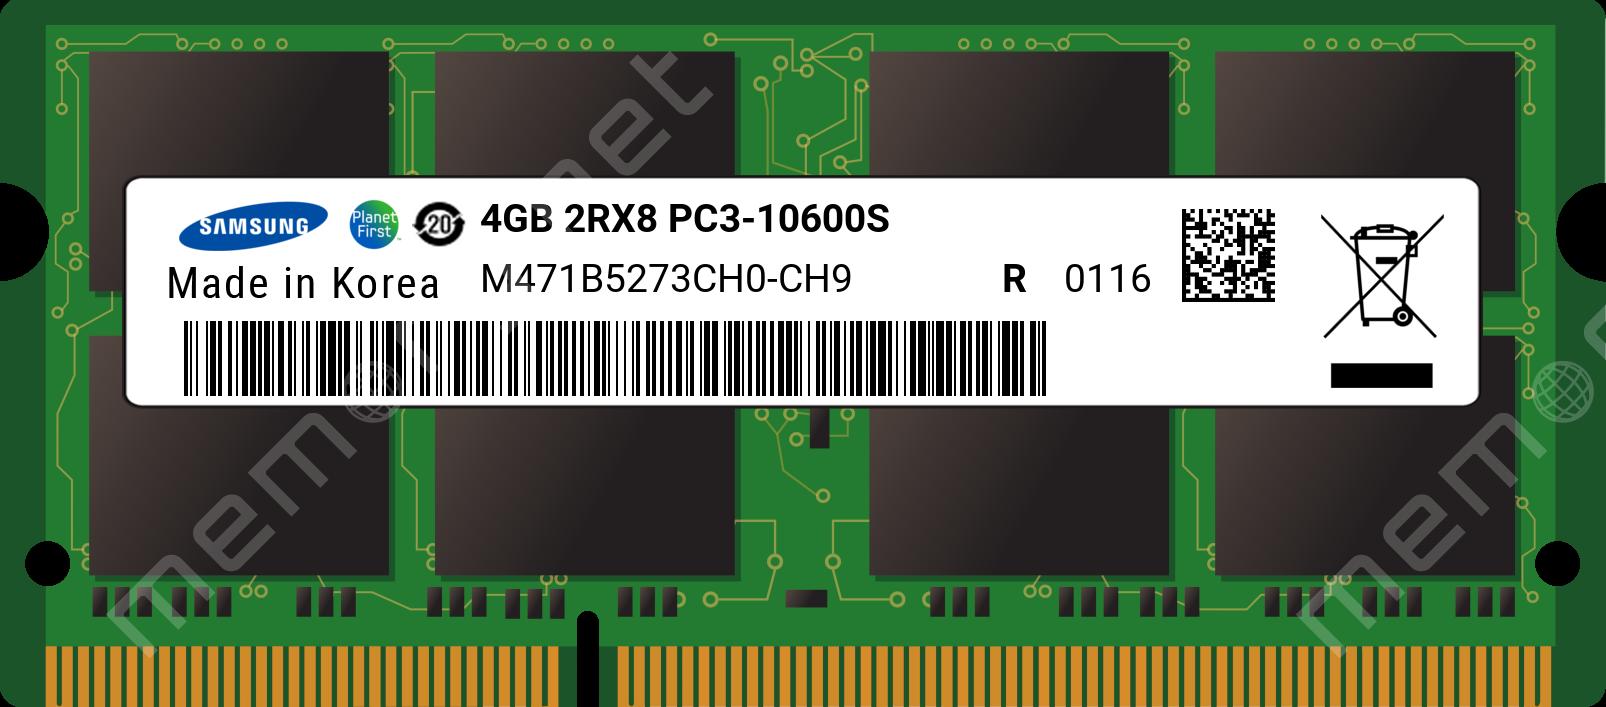 SAMSUNG 4GB RAM 2RX8 PC3-10600S